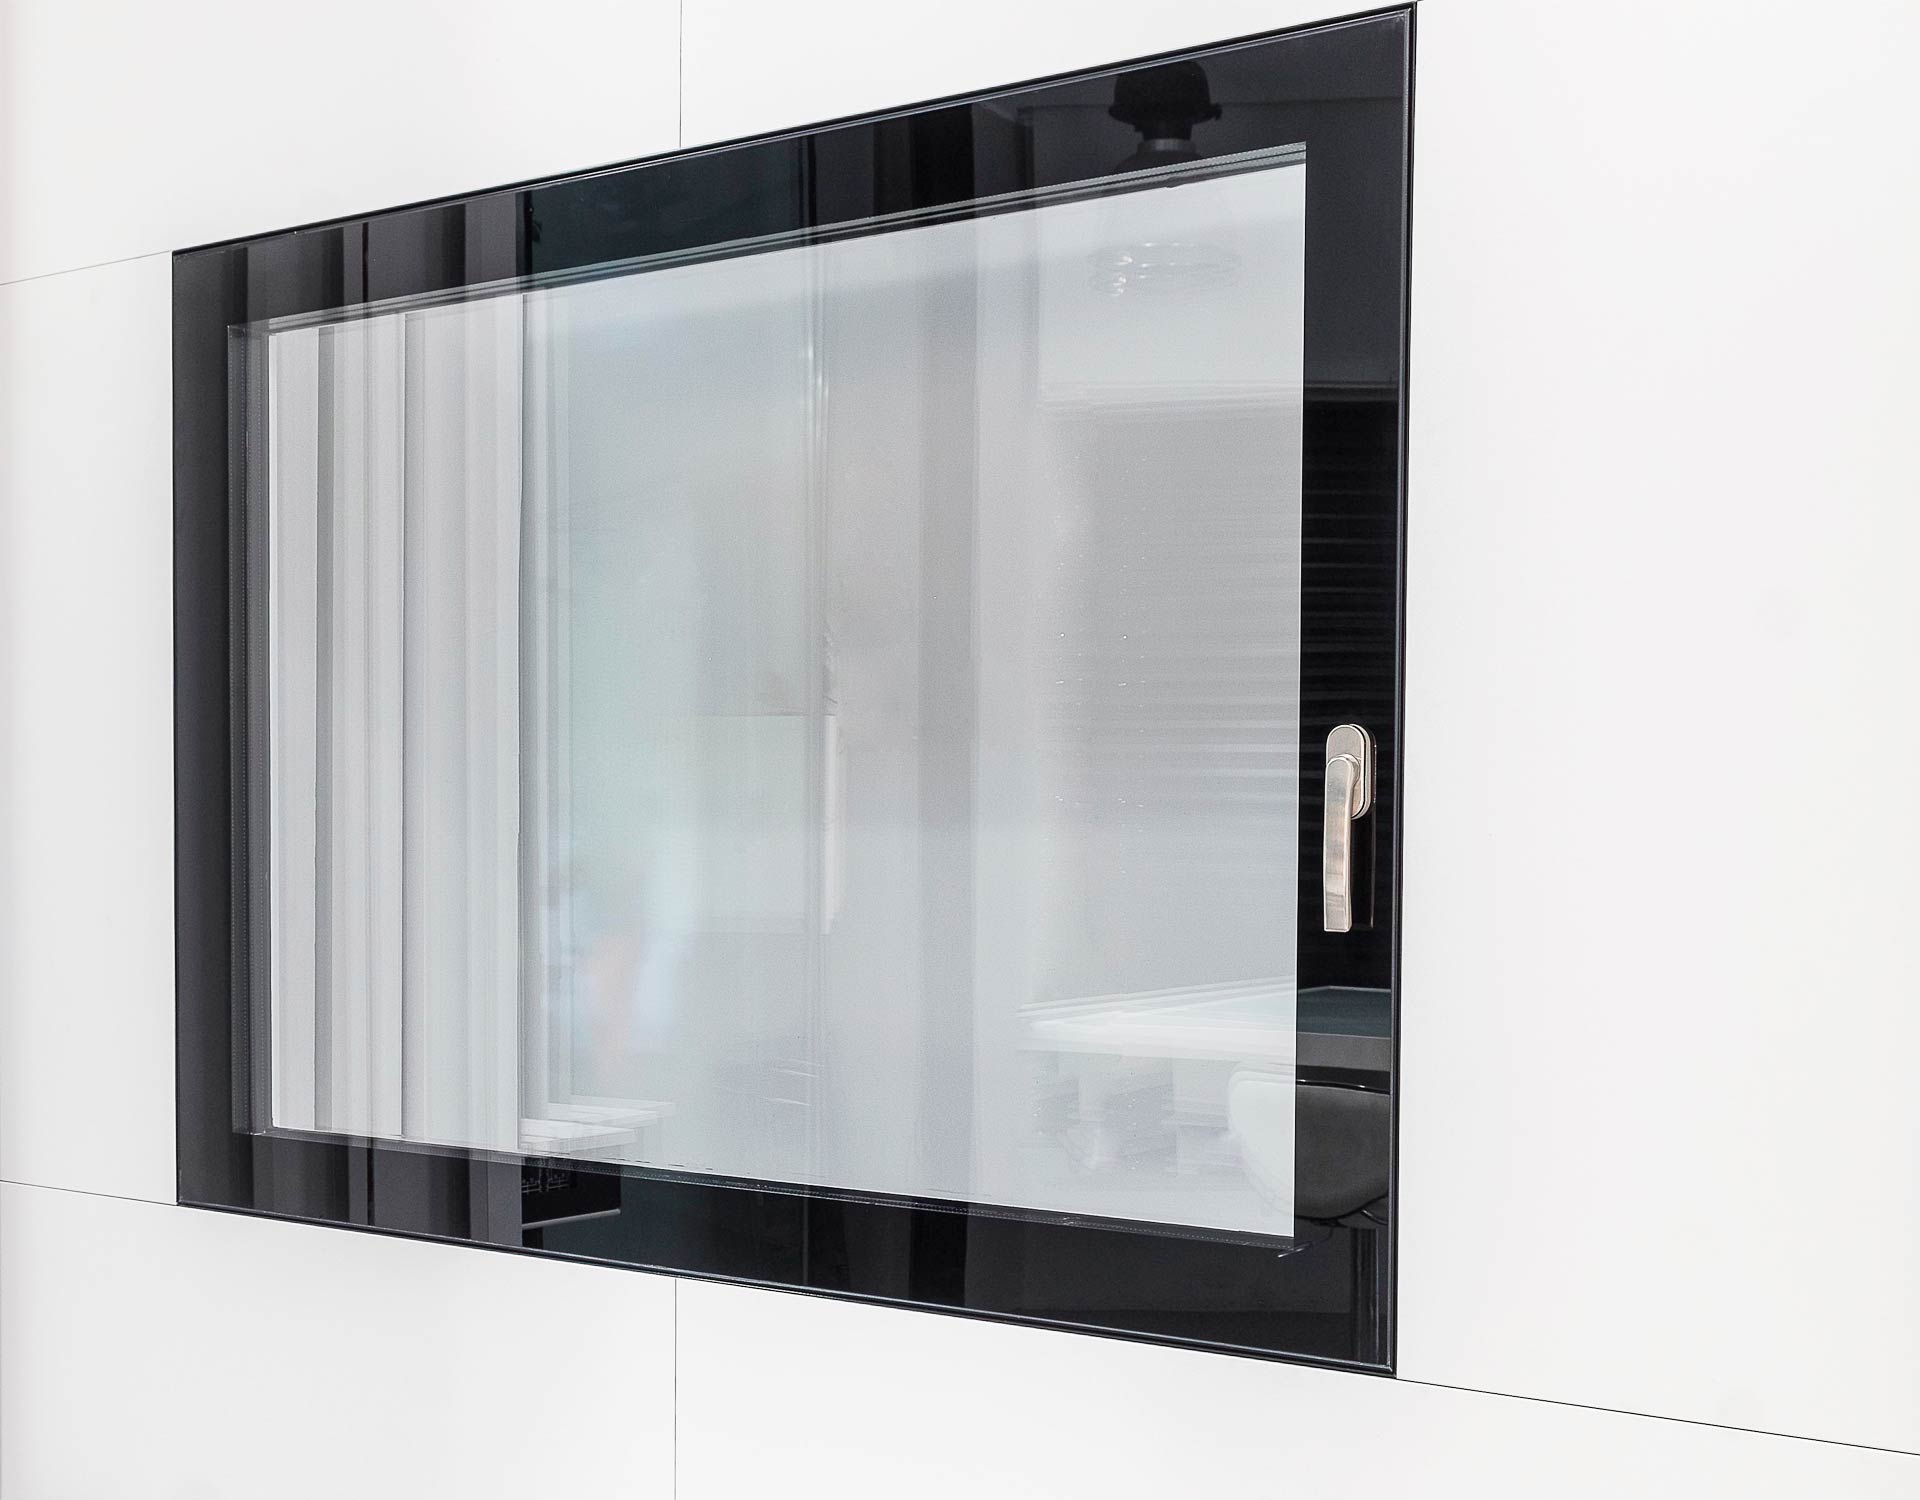 vitrawindow_-ventana-sin-perfiles_ventana-minimalista_-ventana-minimalista-barcelona